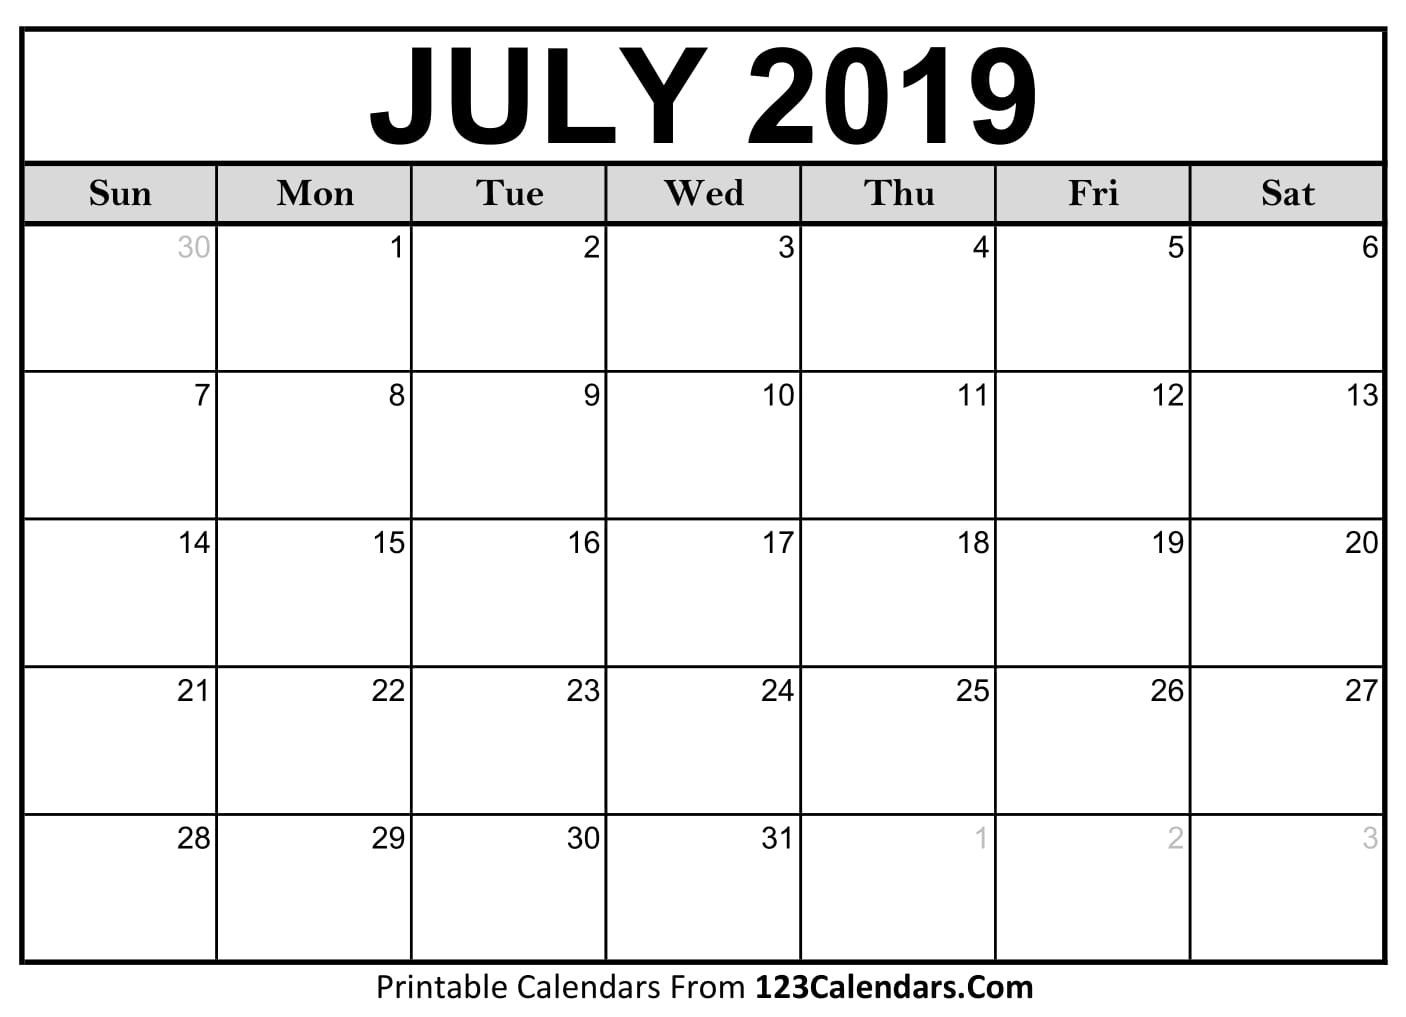 Printable July 2019 Calendar Templates 123Calendars